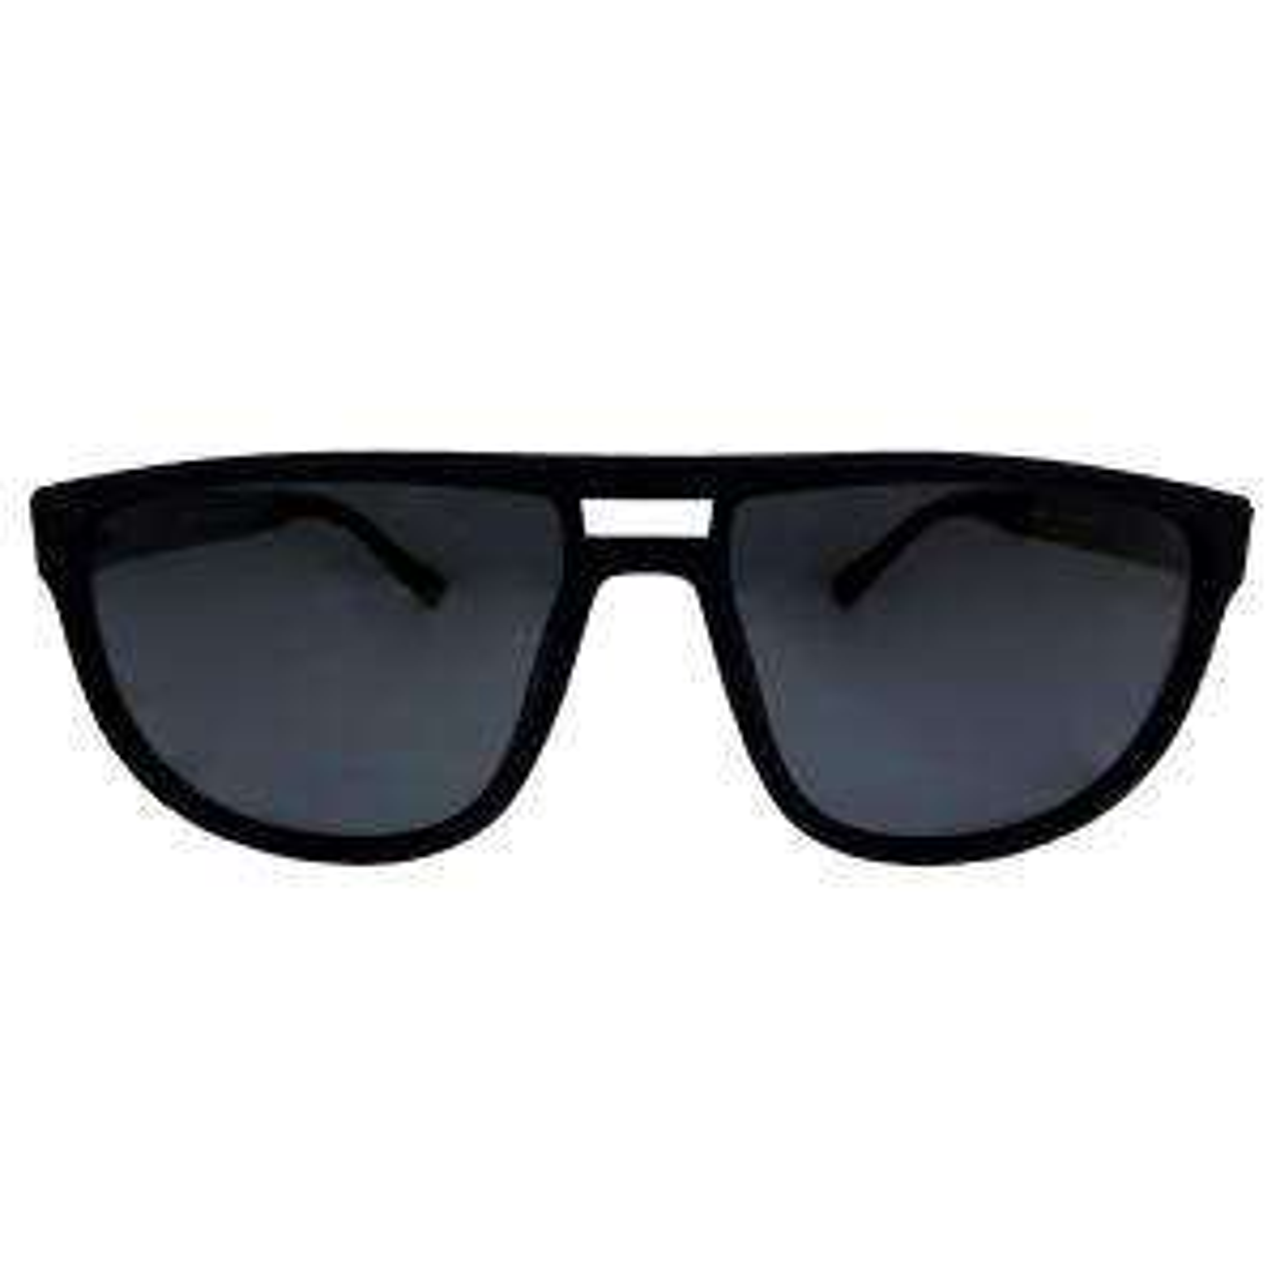 عینک آفتابی مدل OG3587 C2-MO5-1